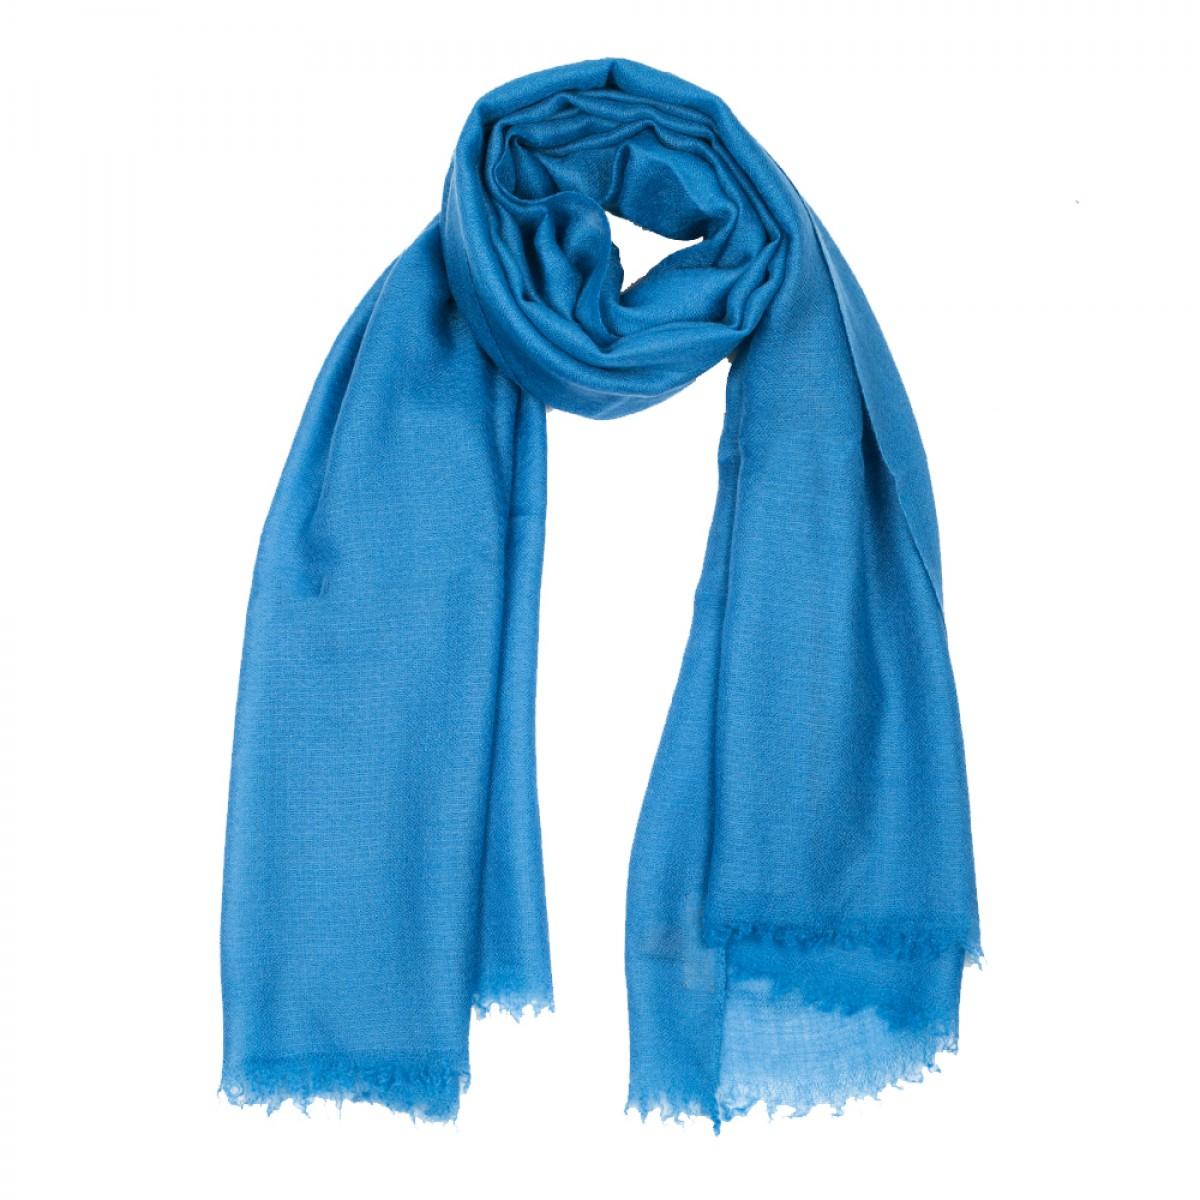 Plain Pashmina Stole - Yale Blue